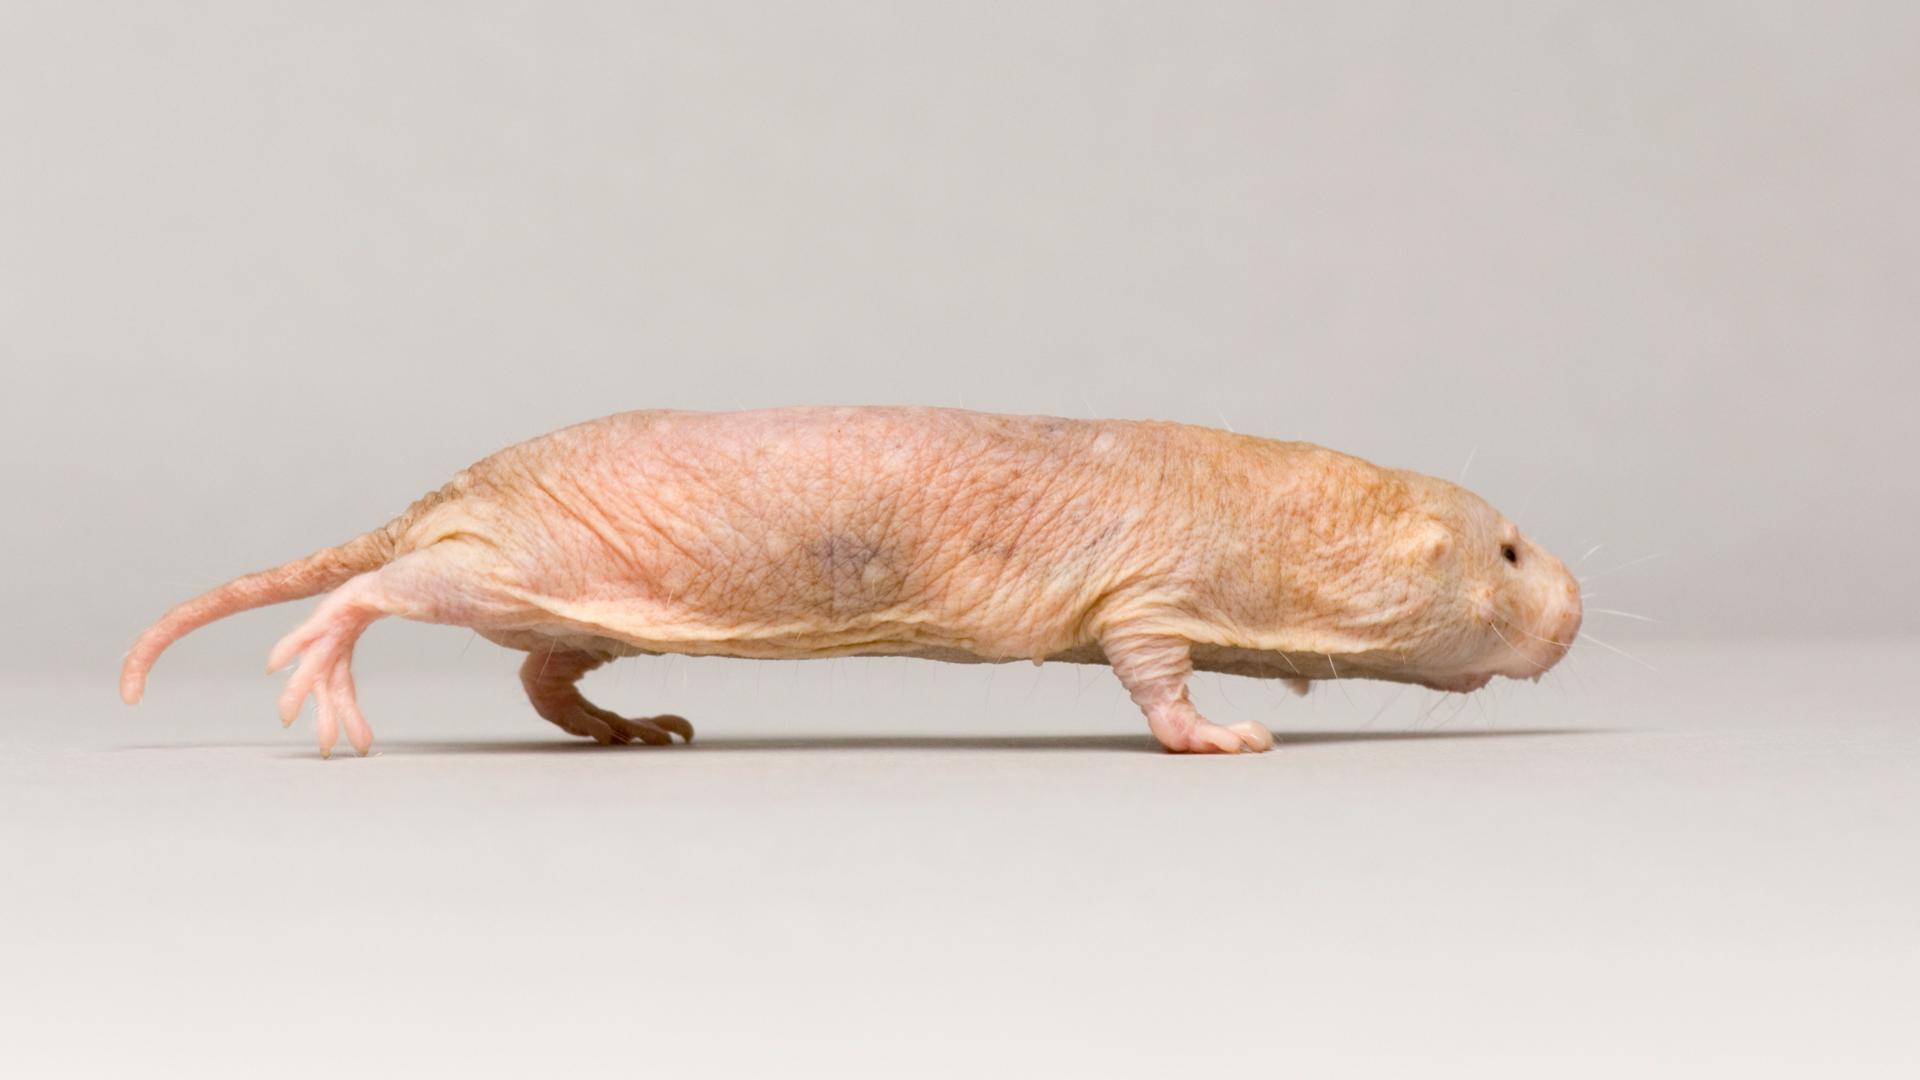 Creature Clip: Naked Mole Rat